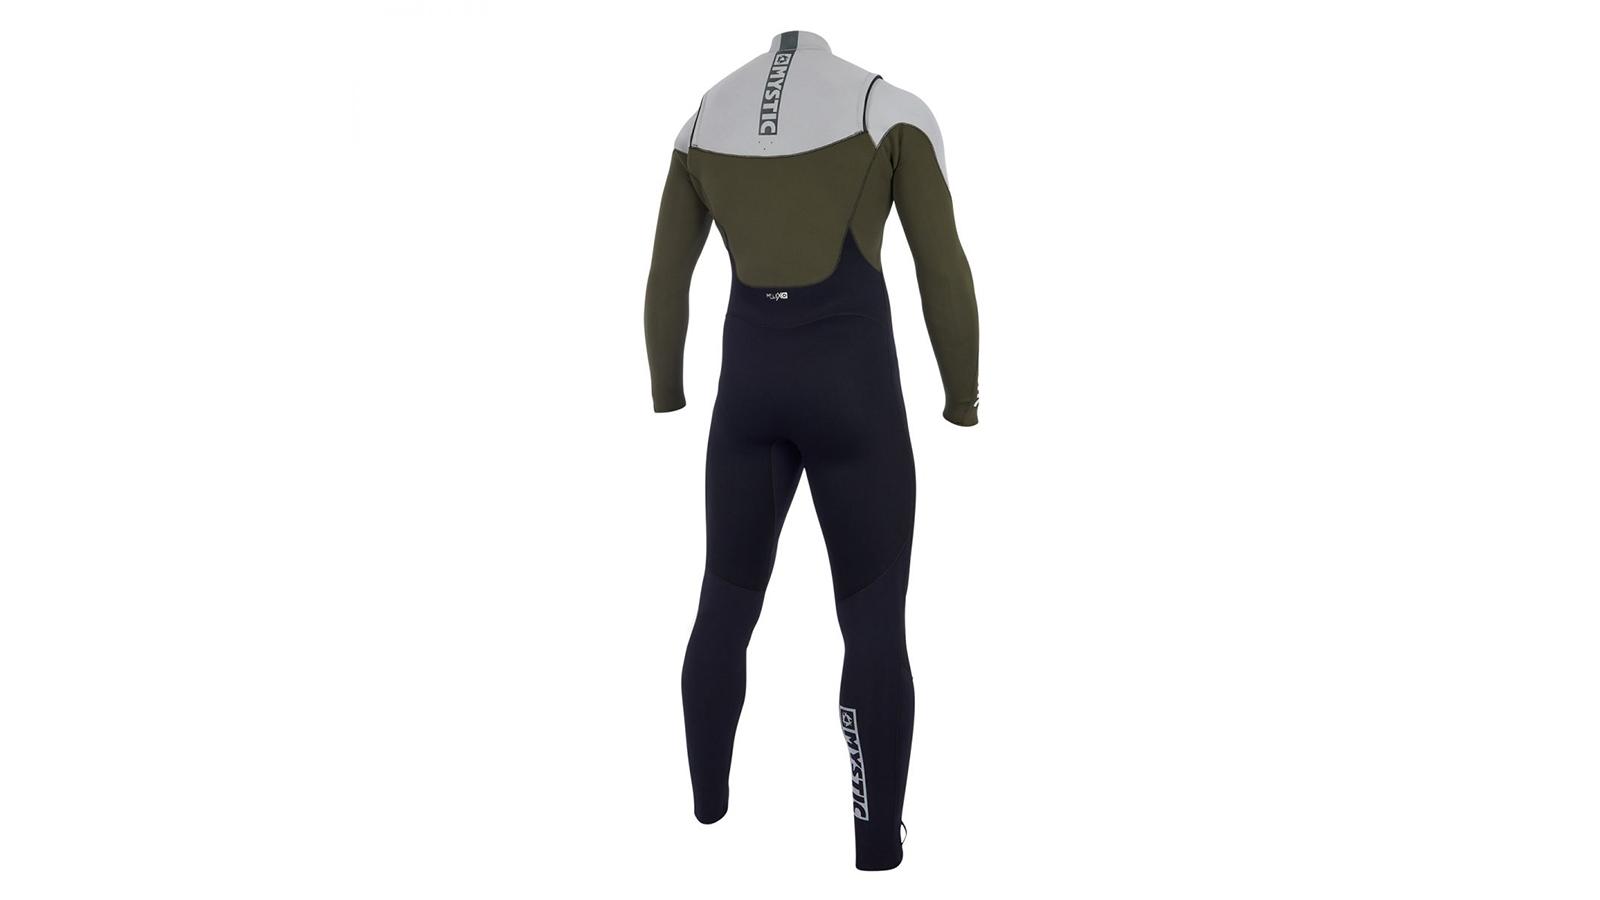 Wetsuit-Star-fullsuit-54-fz-695-b-1819